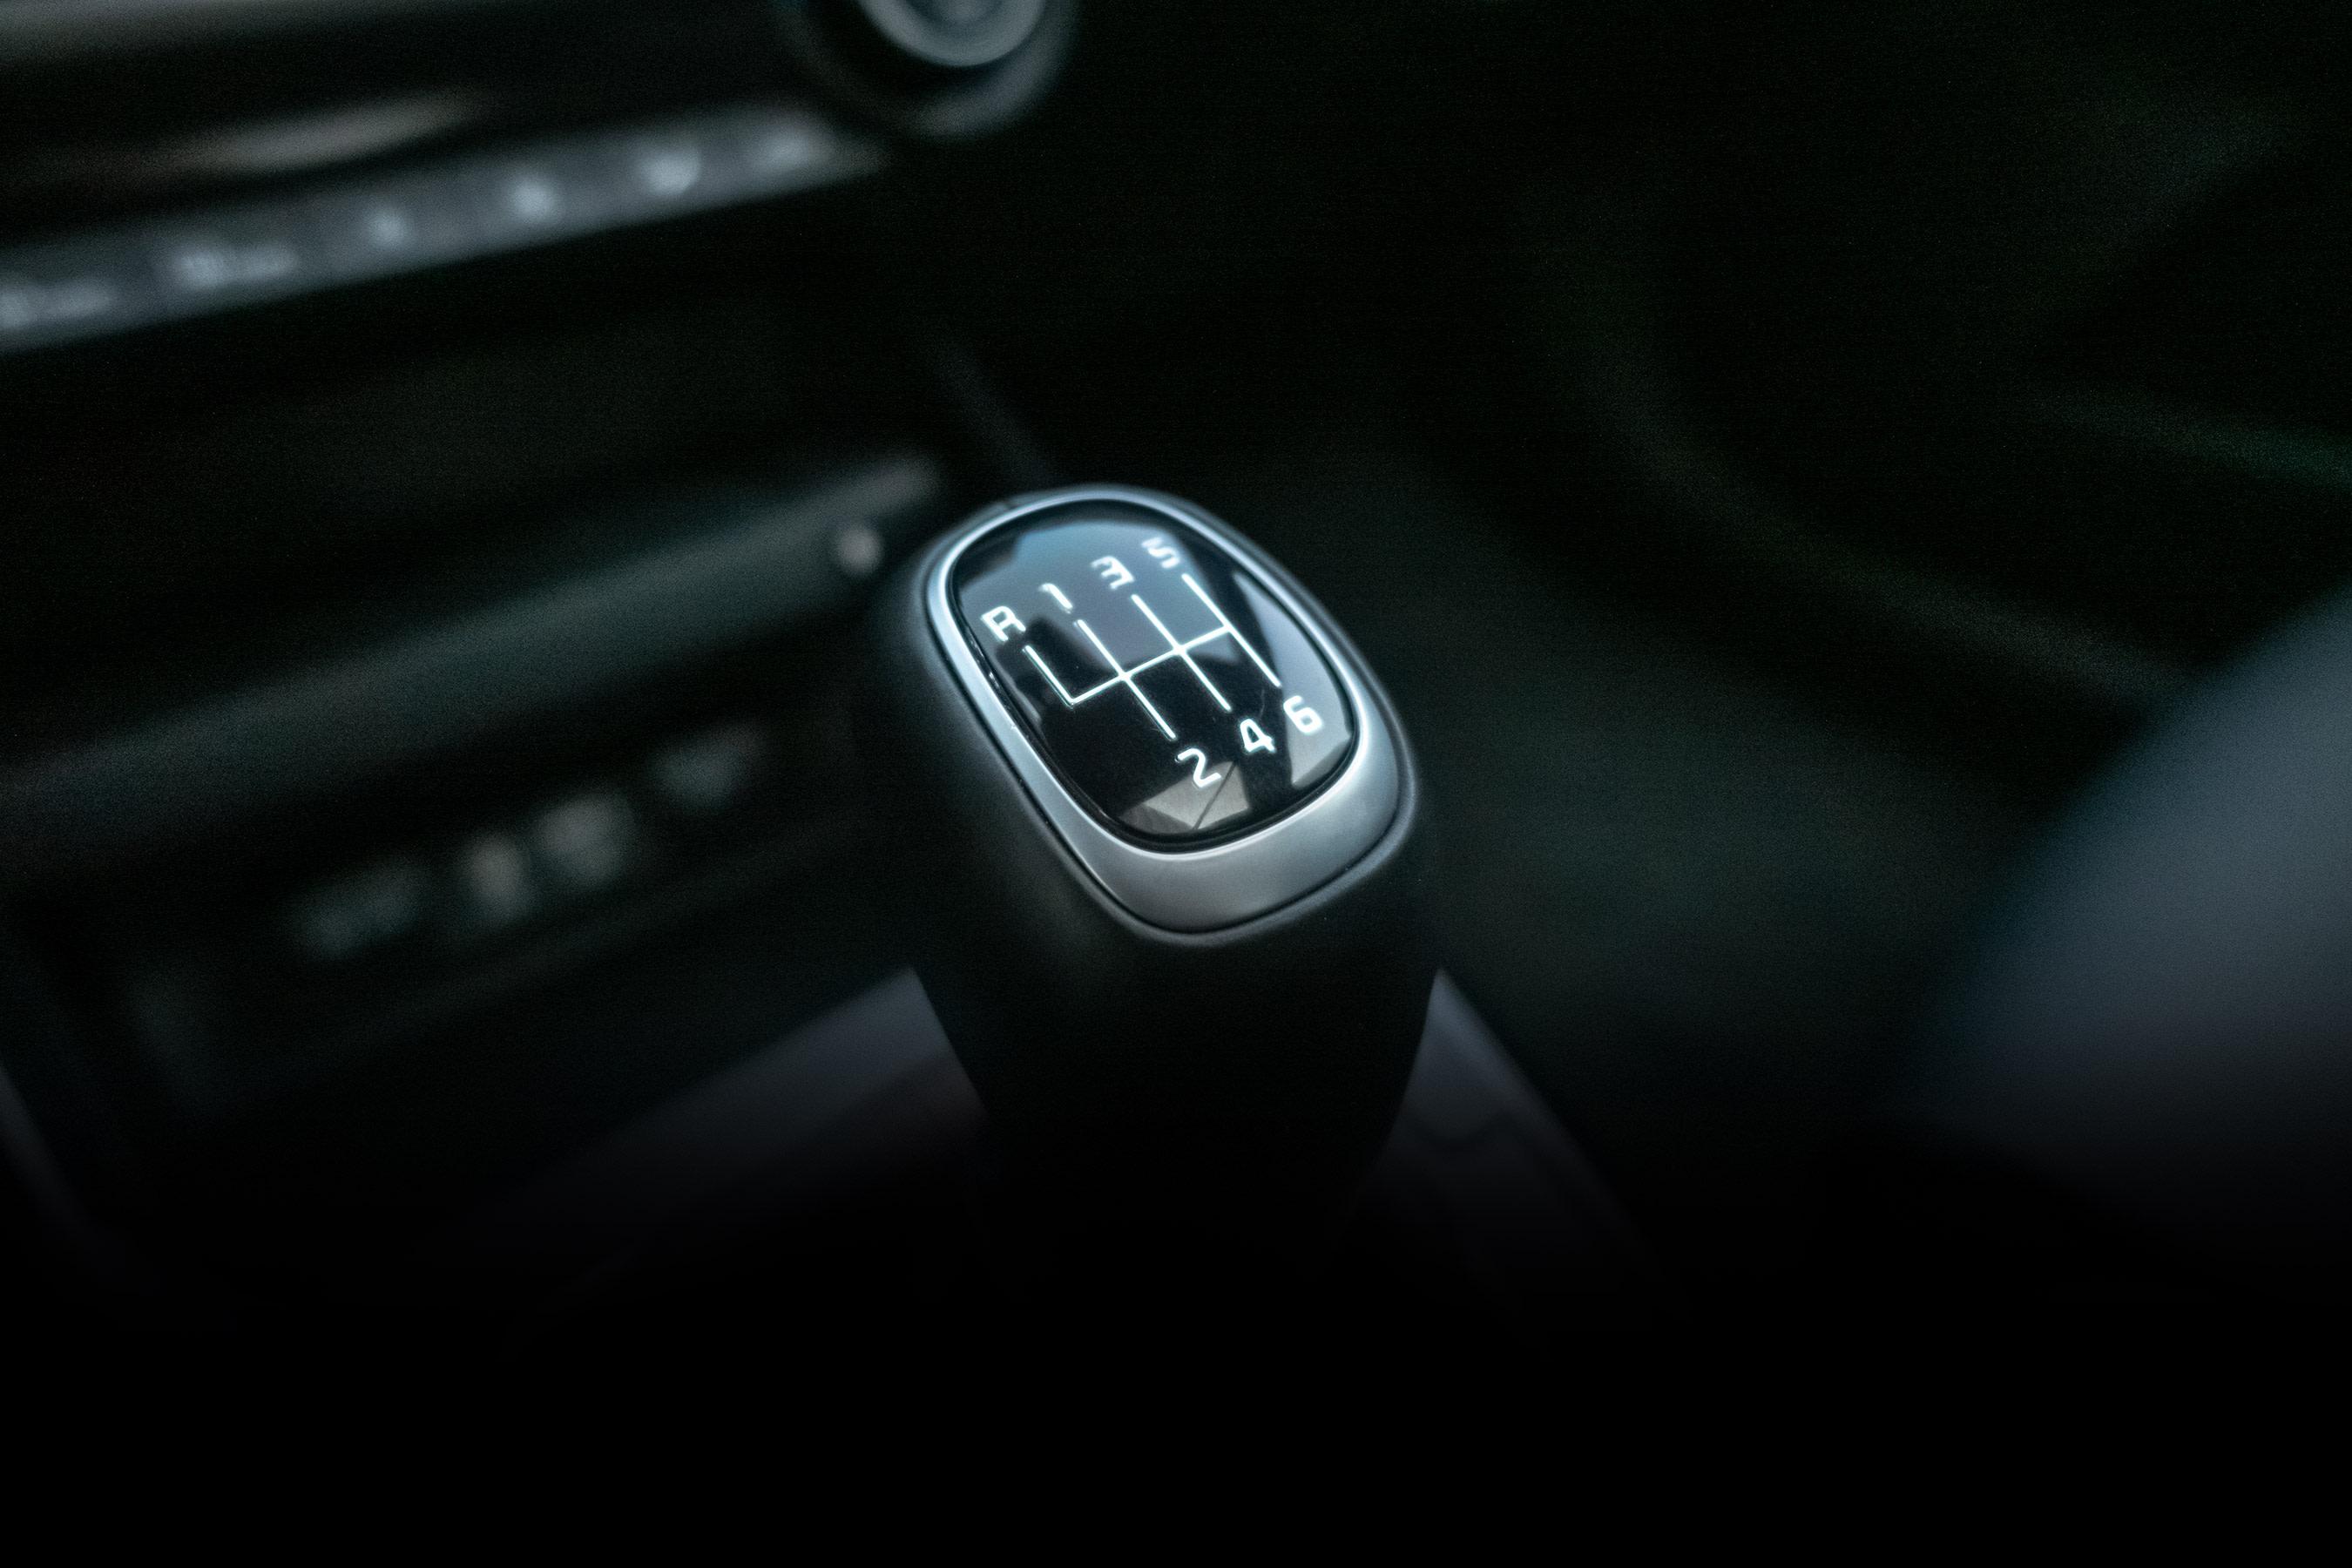 Shifting Gears in the 2020 Kia Forte